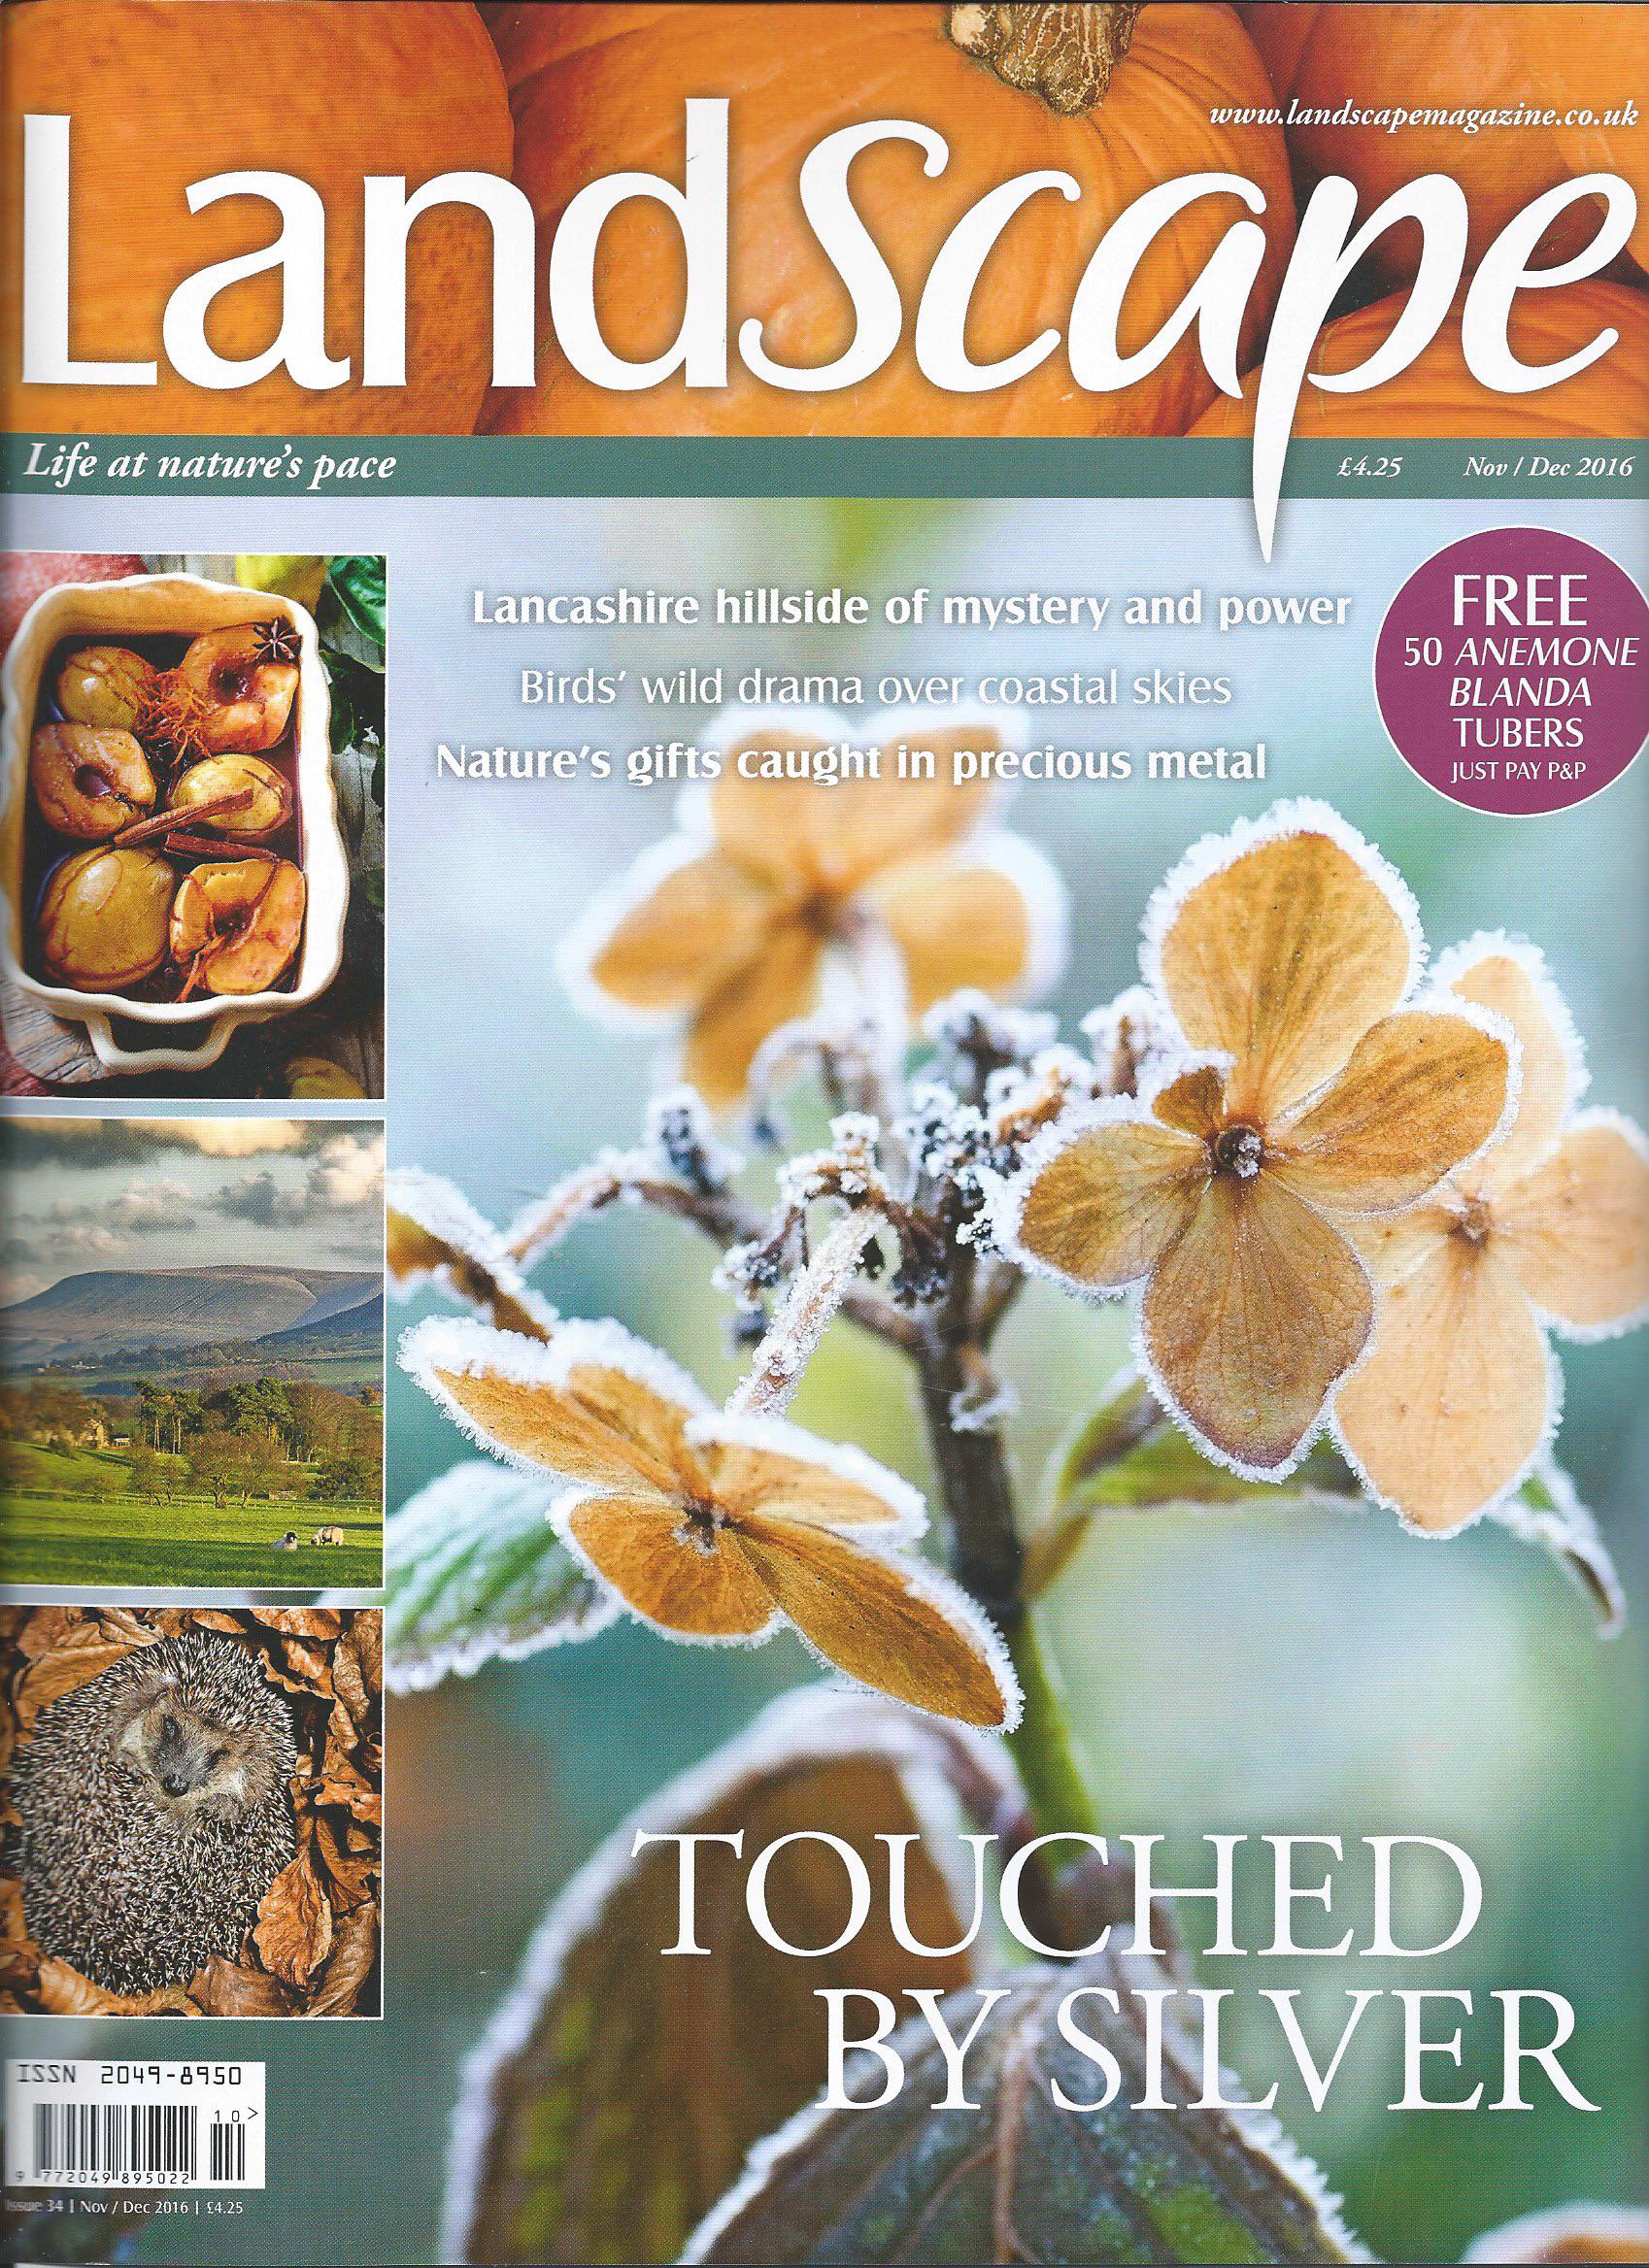 Landscape Nov 2016 Cover.jpg